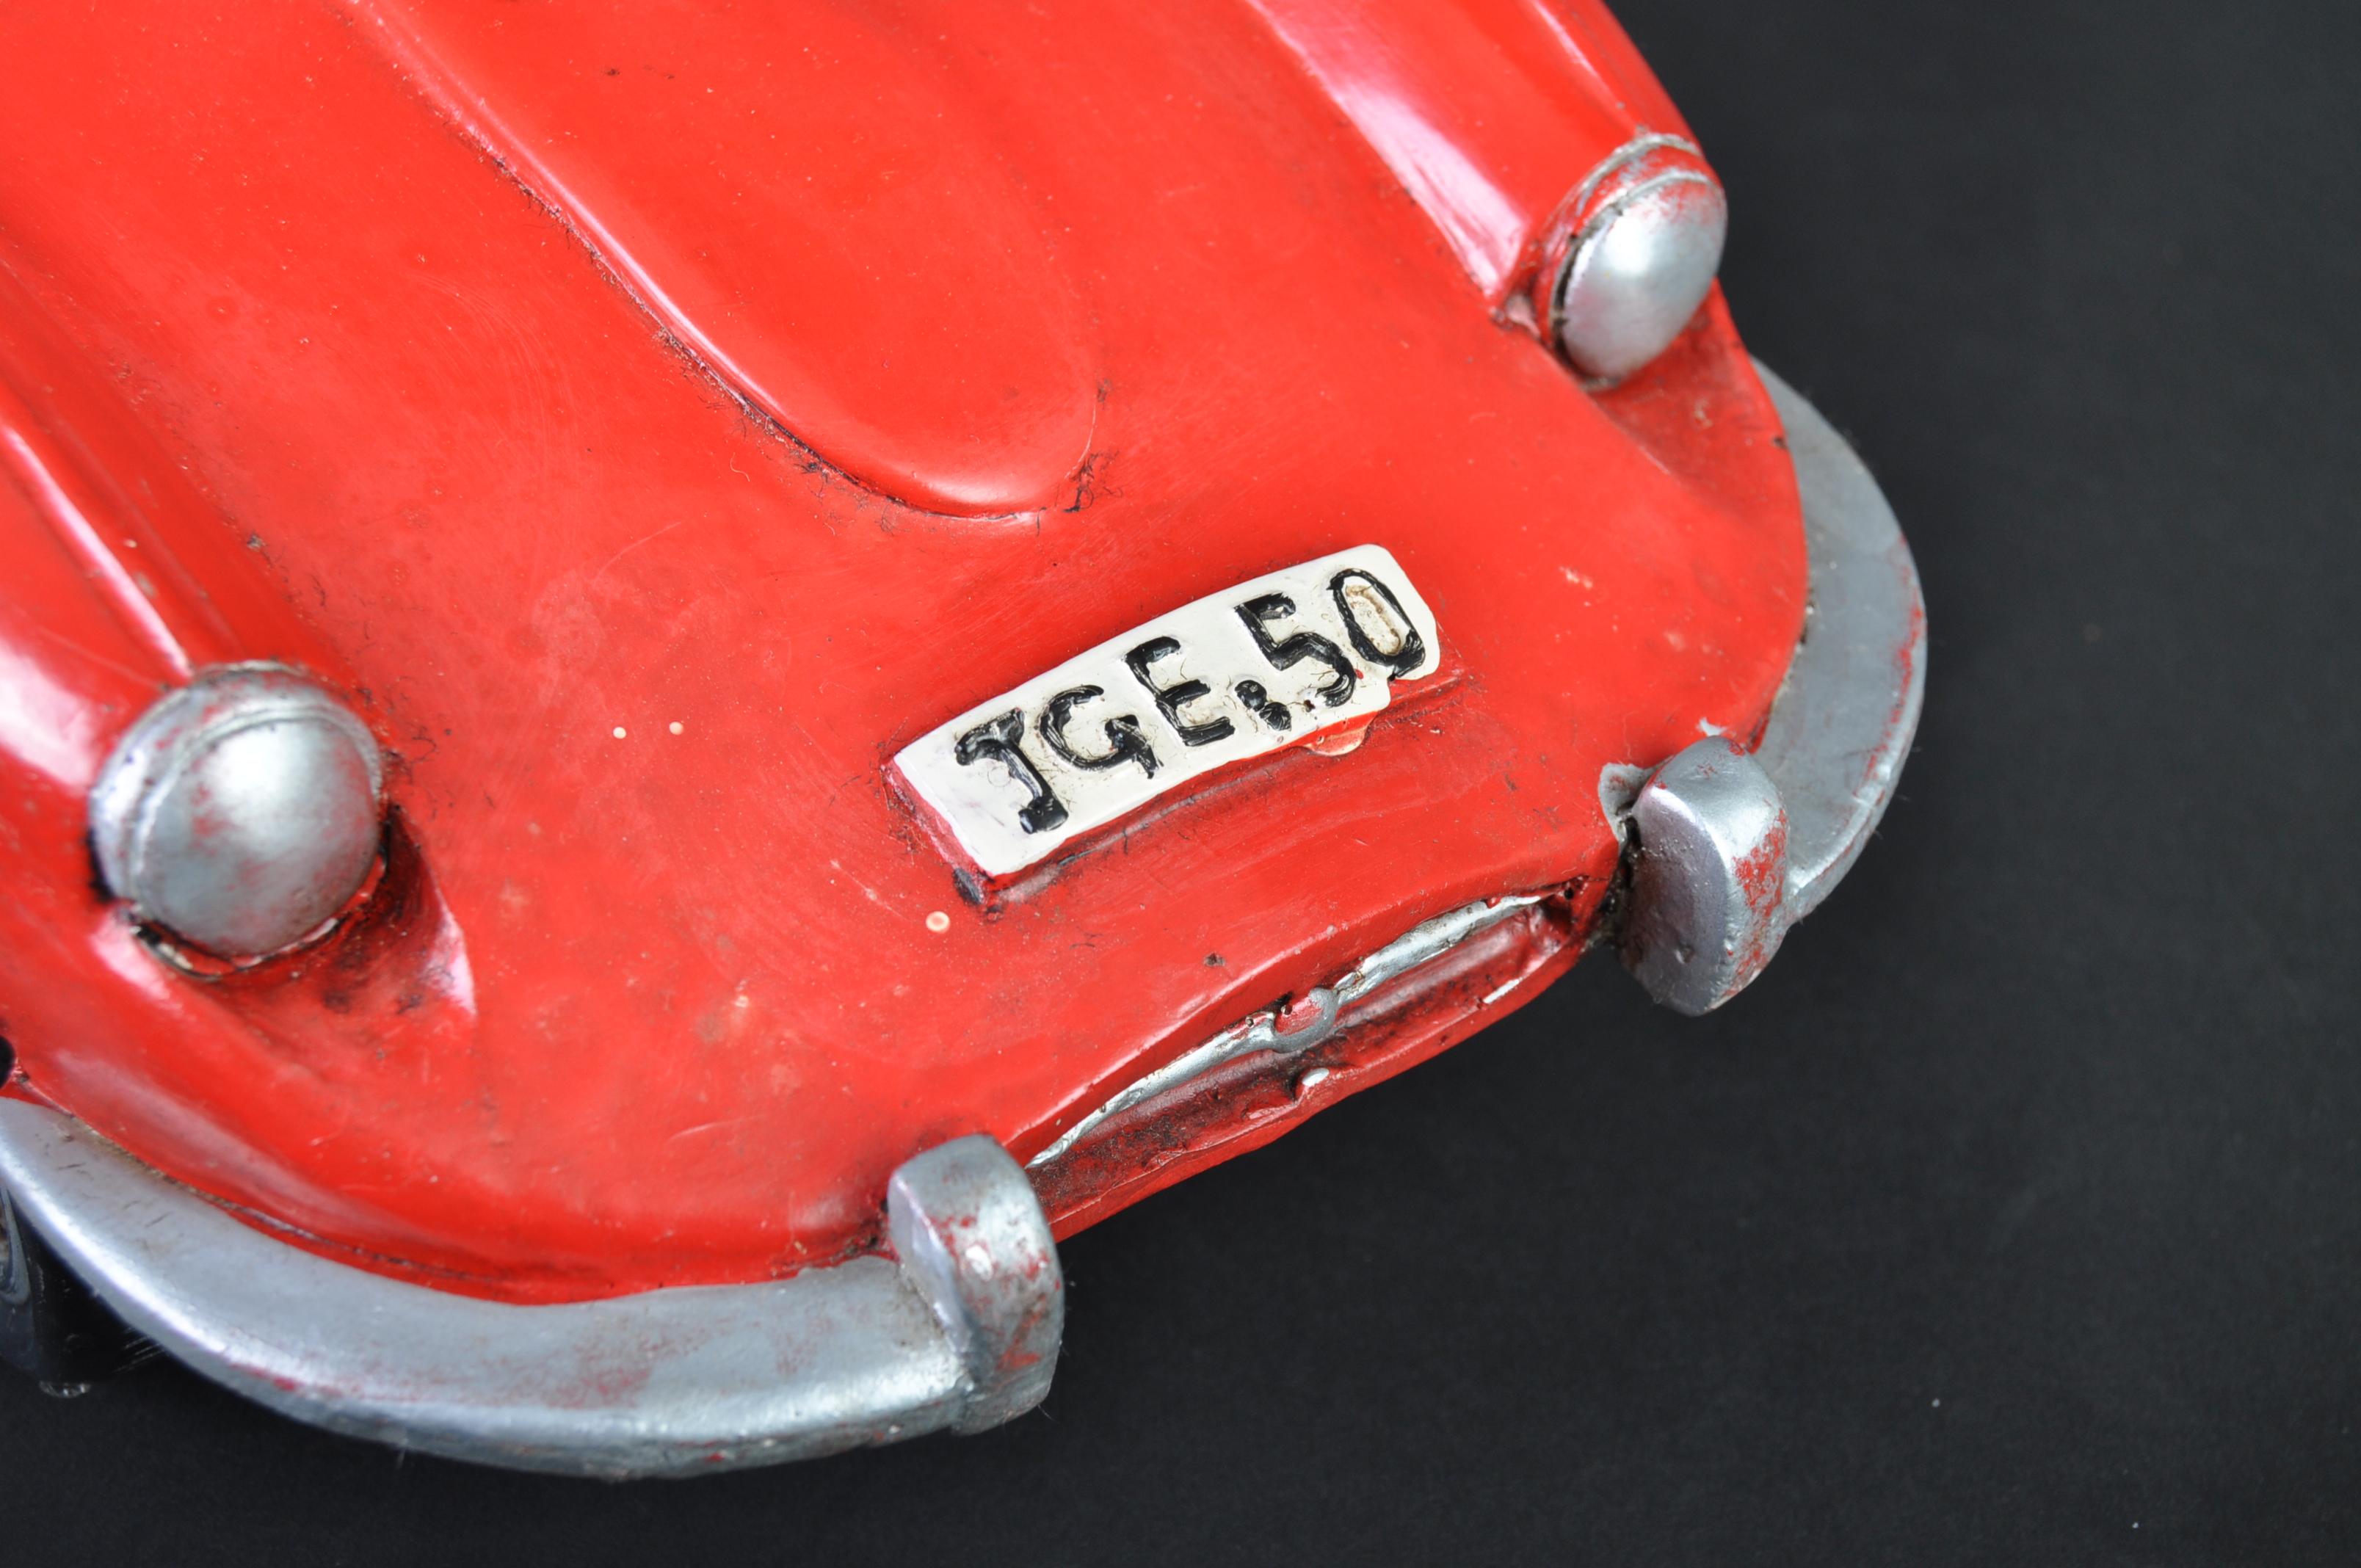 JAGUAR - 20TH CENTURY LARGE RESIN MODEL E TYPE JAGUAR - Image 5 of 6